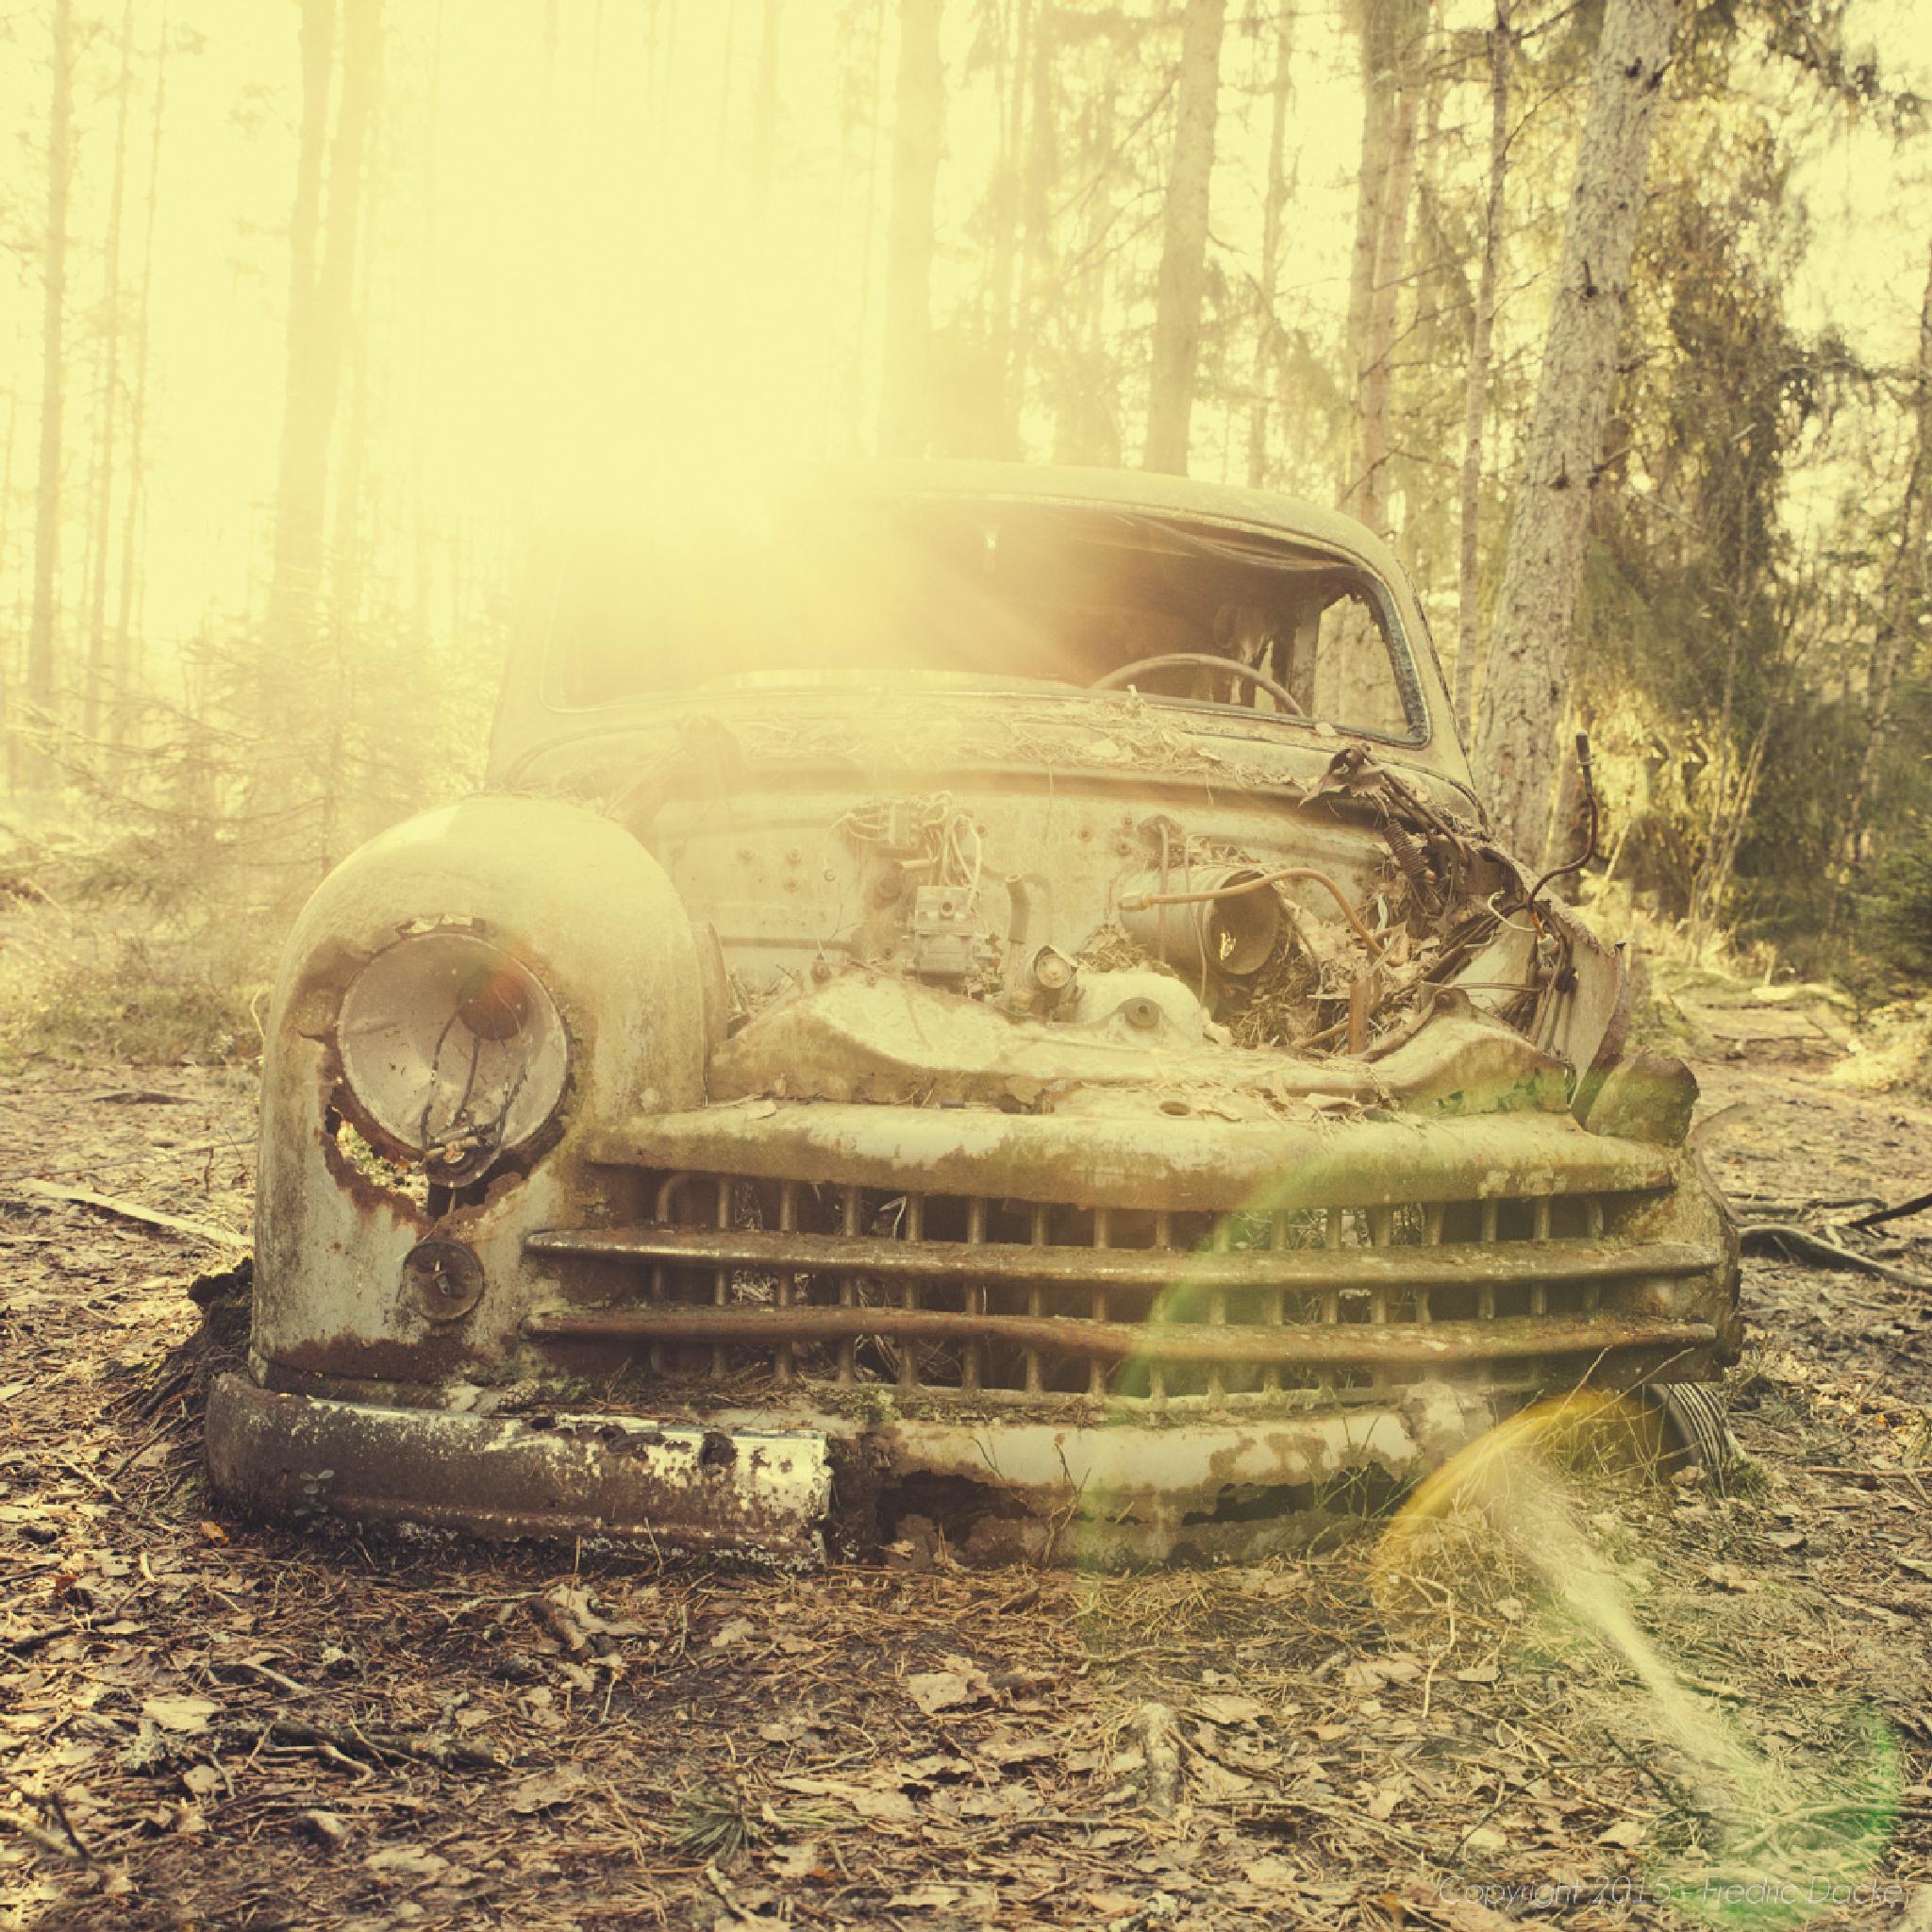 An Old Car by Fredric Dacke Photography